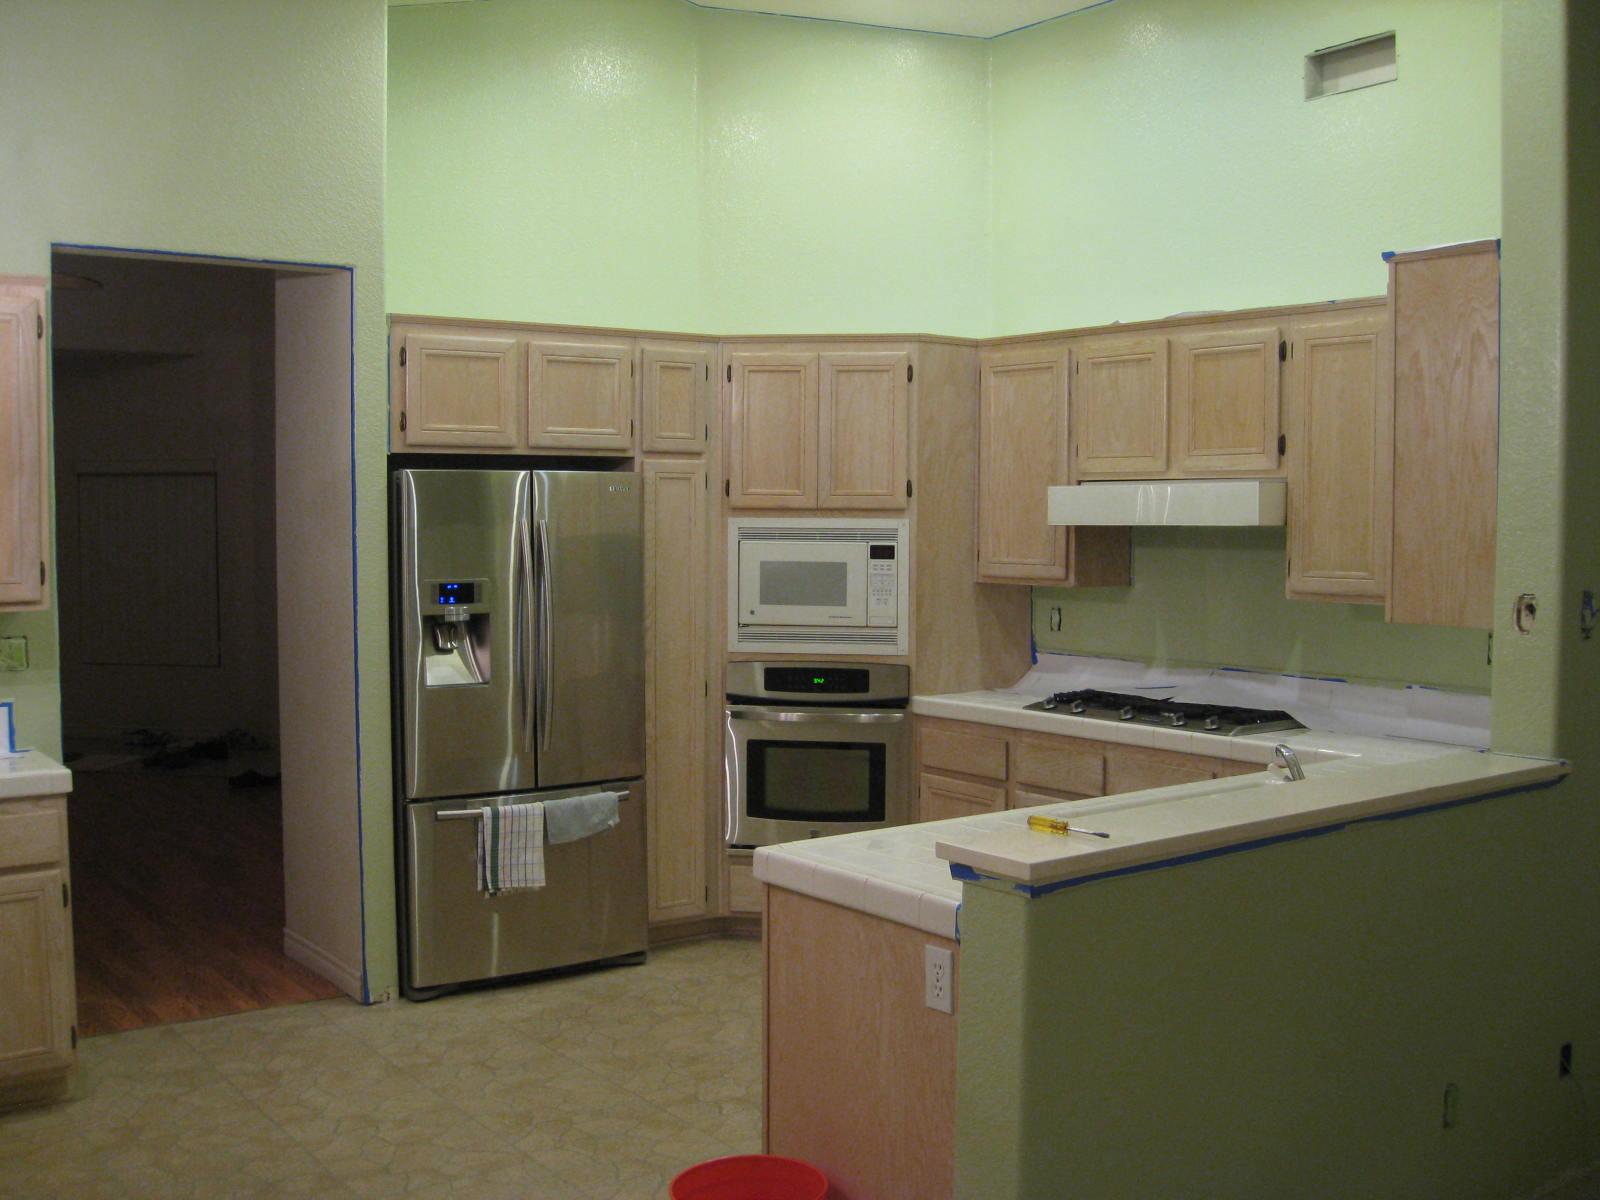 paint color for kitchen jimmy birdie img_1905jpg - Kitchen Color Paint Ideas